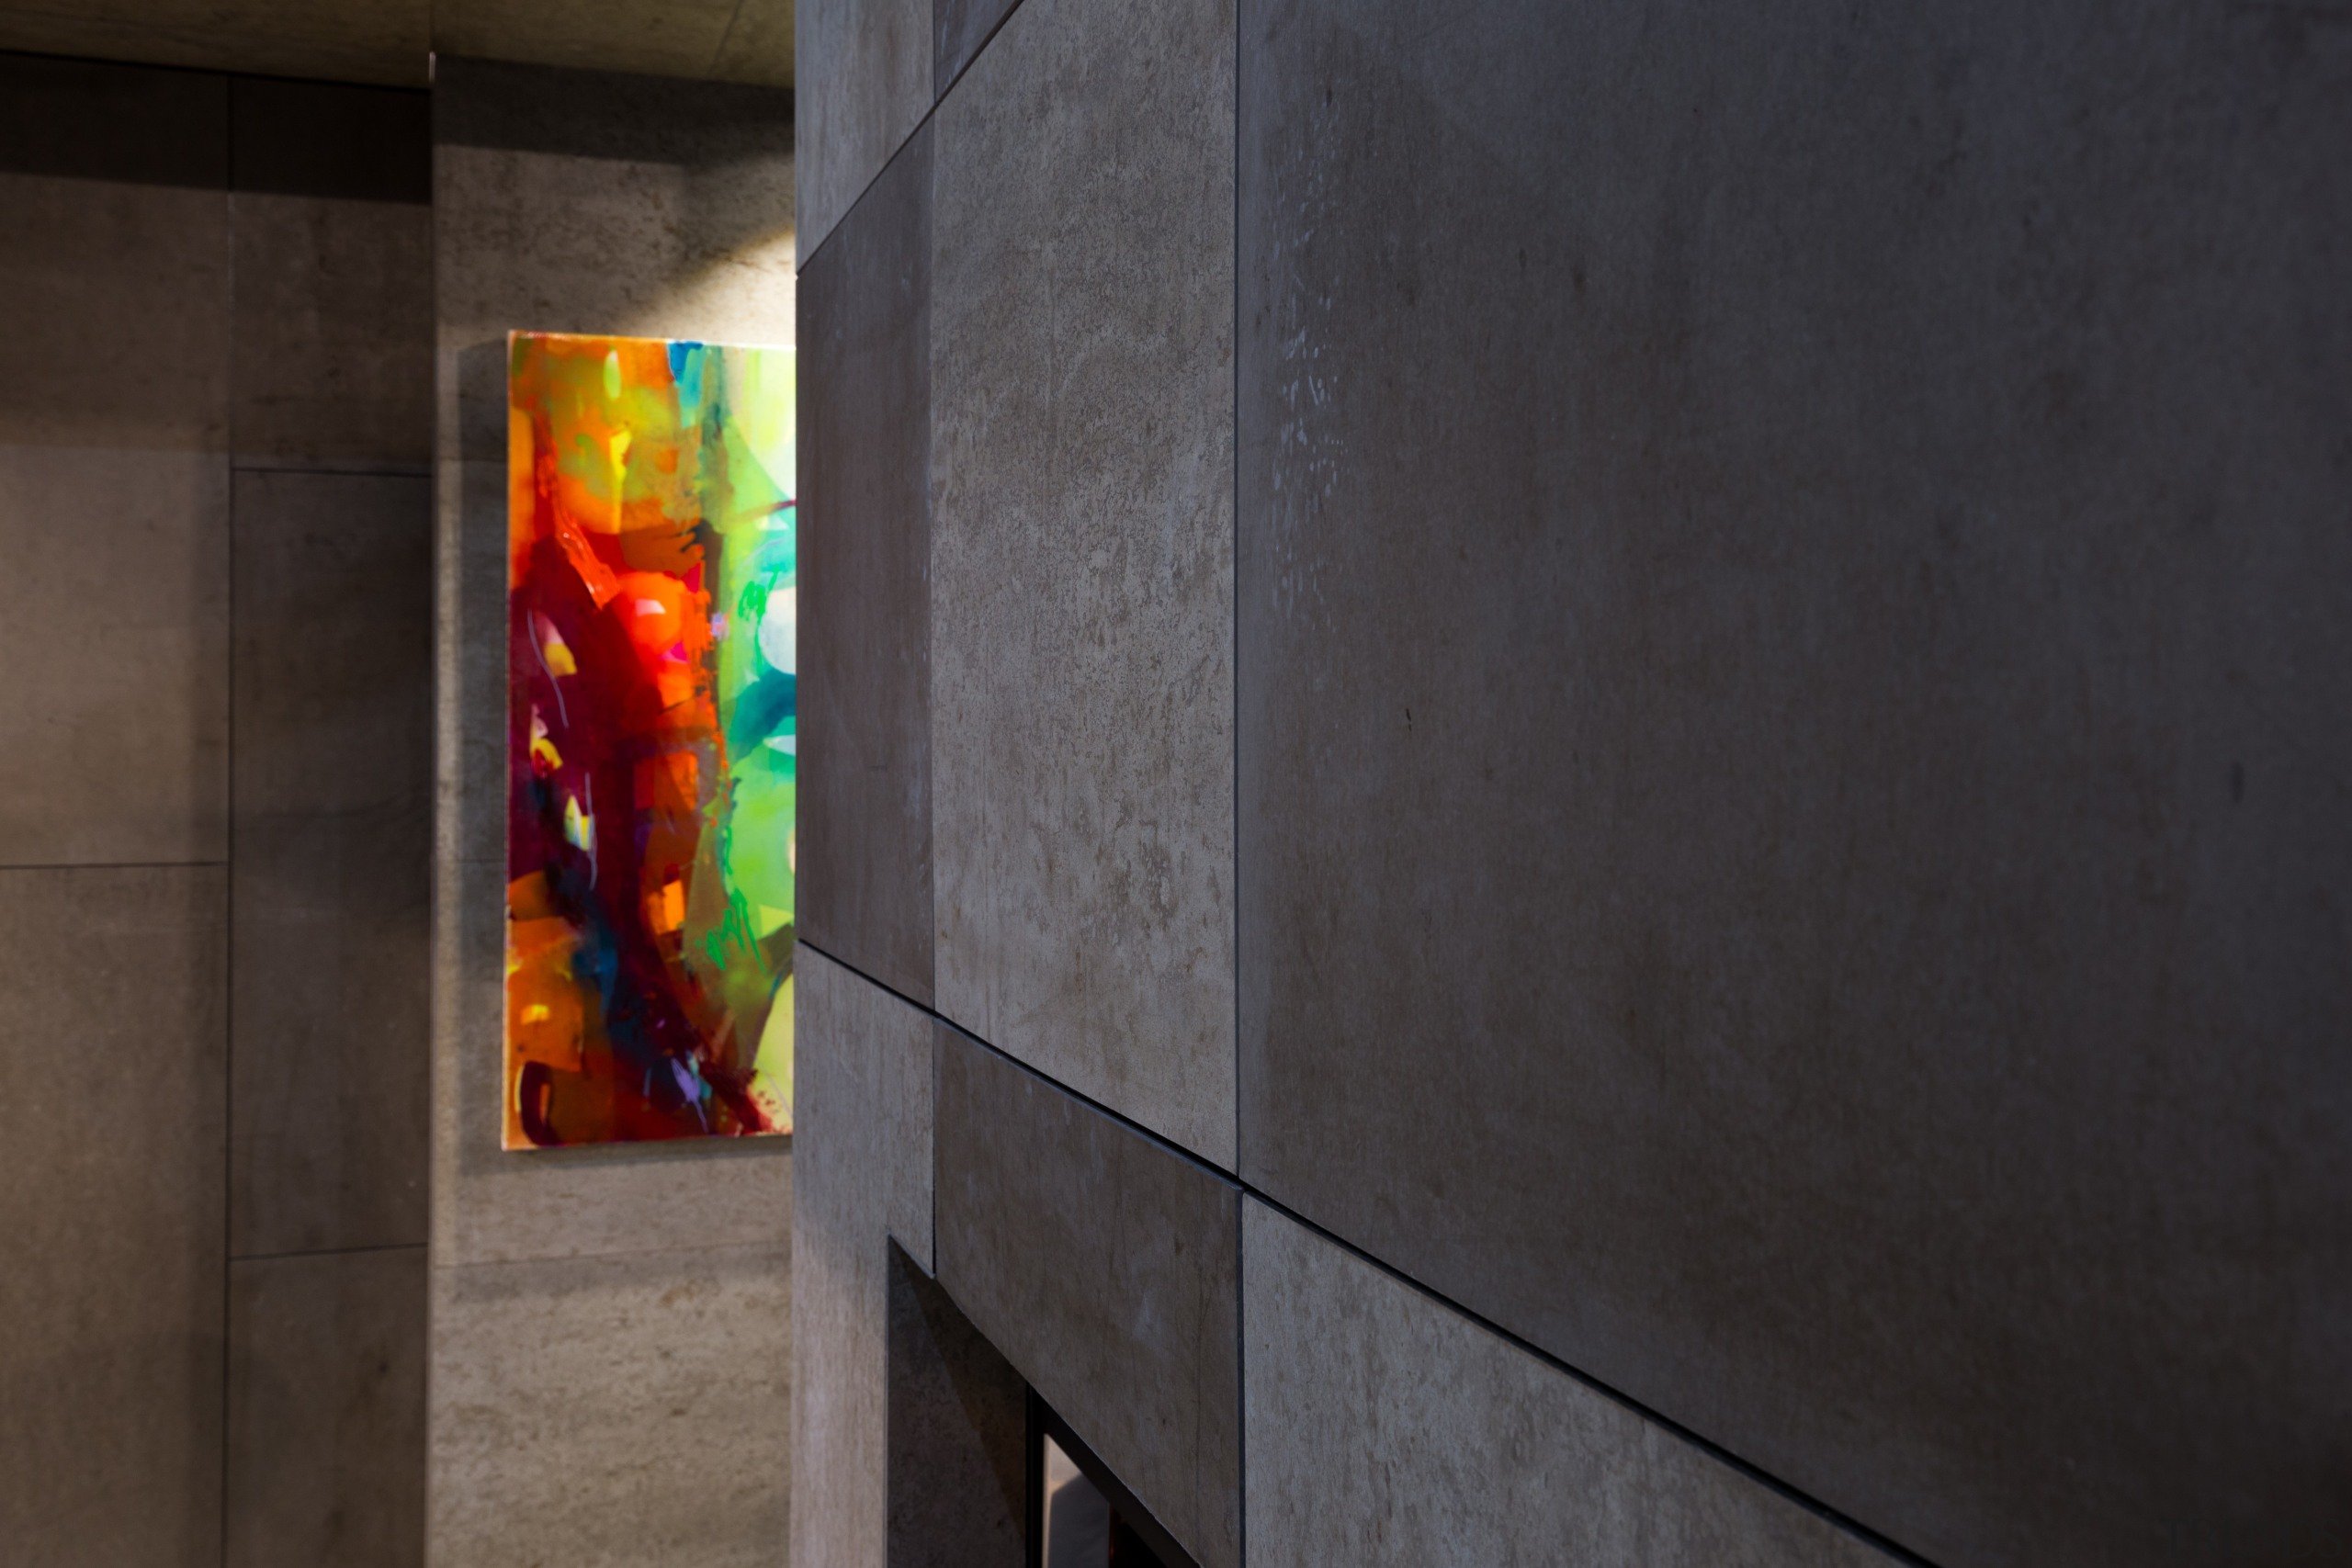 IMG_6184 - glass   wall   black glass, wall, black